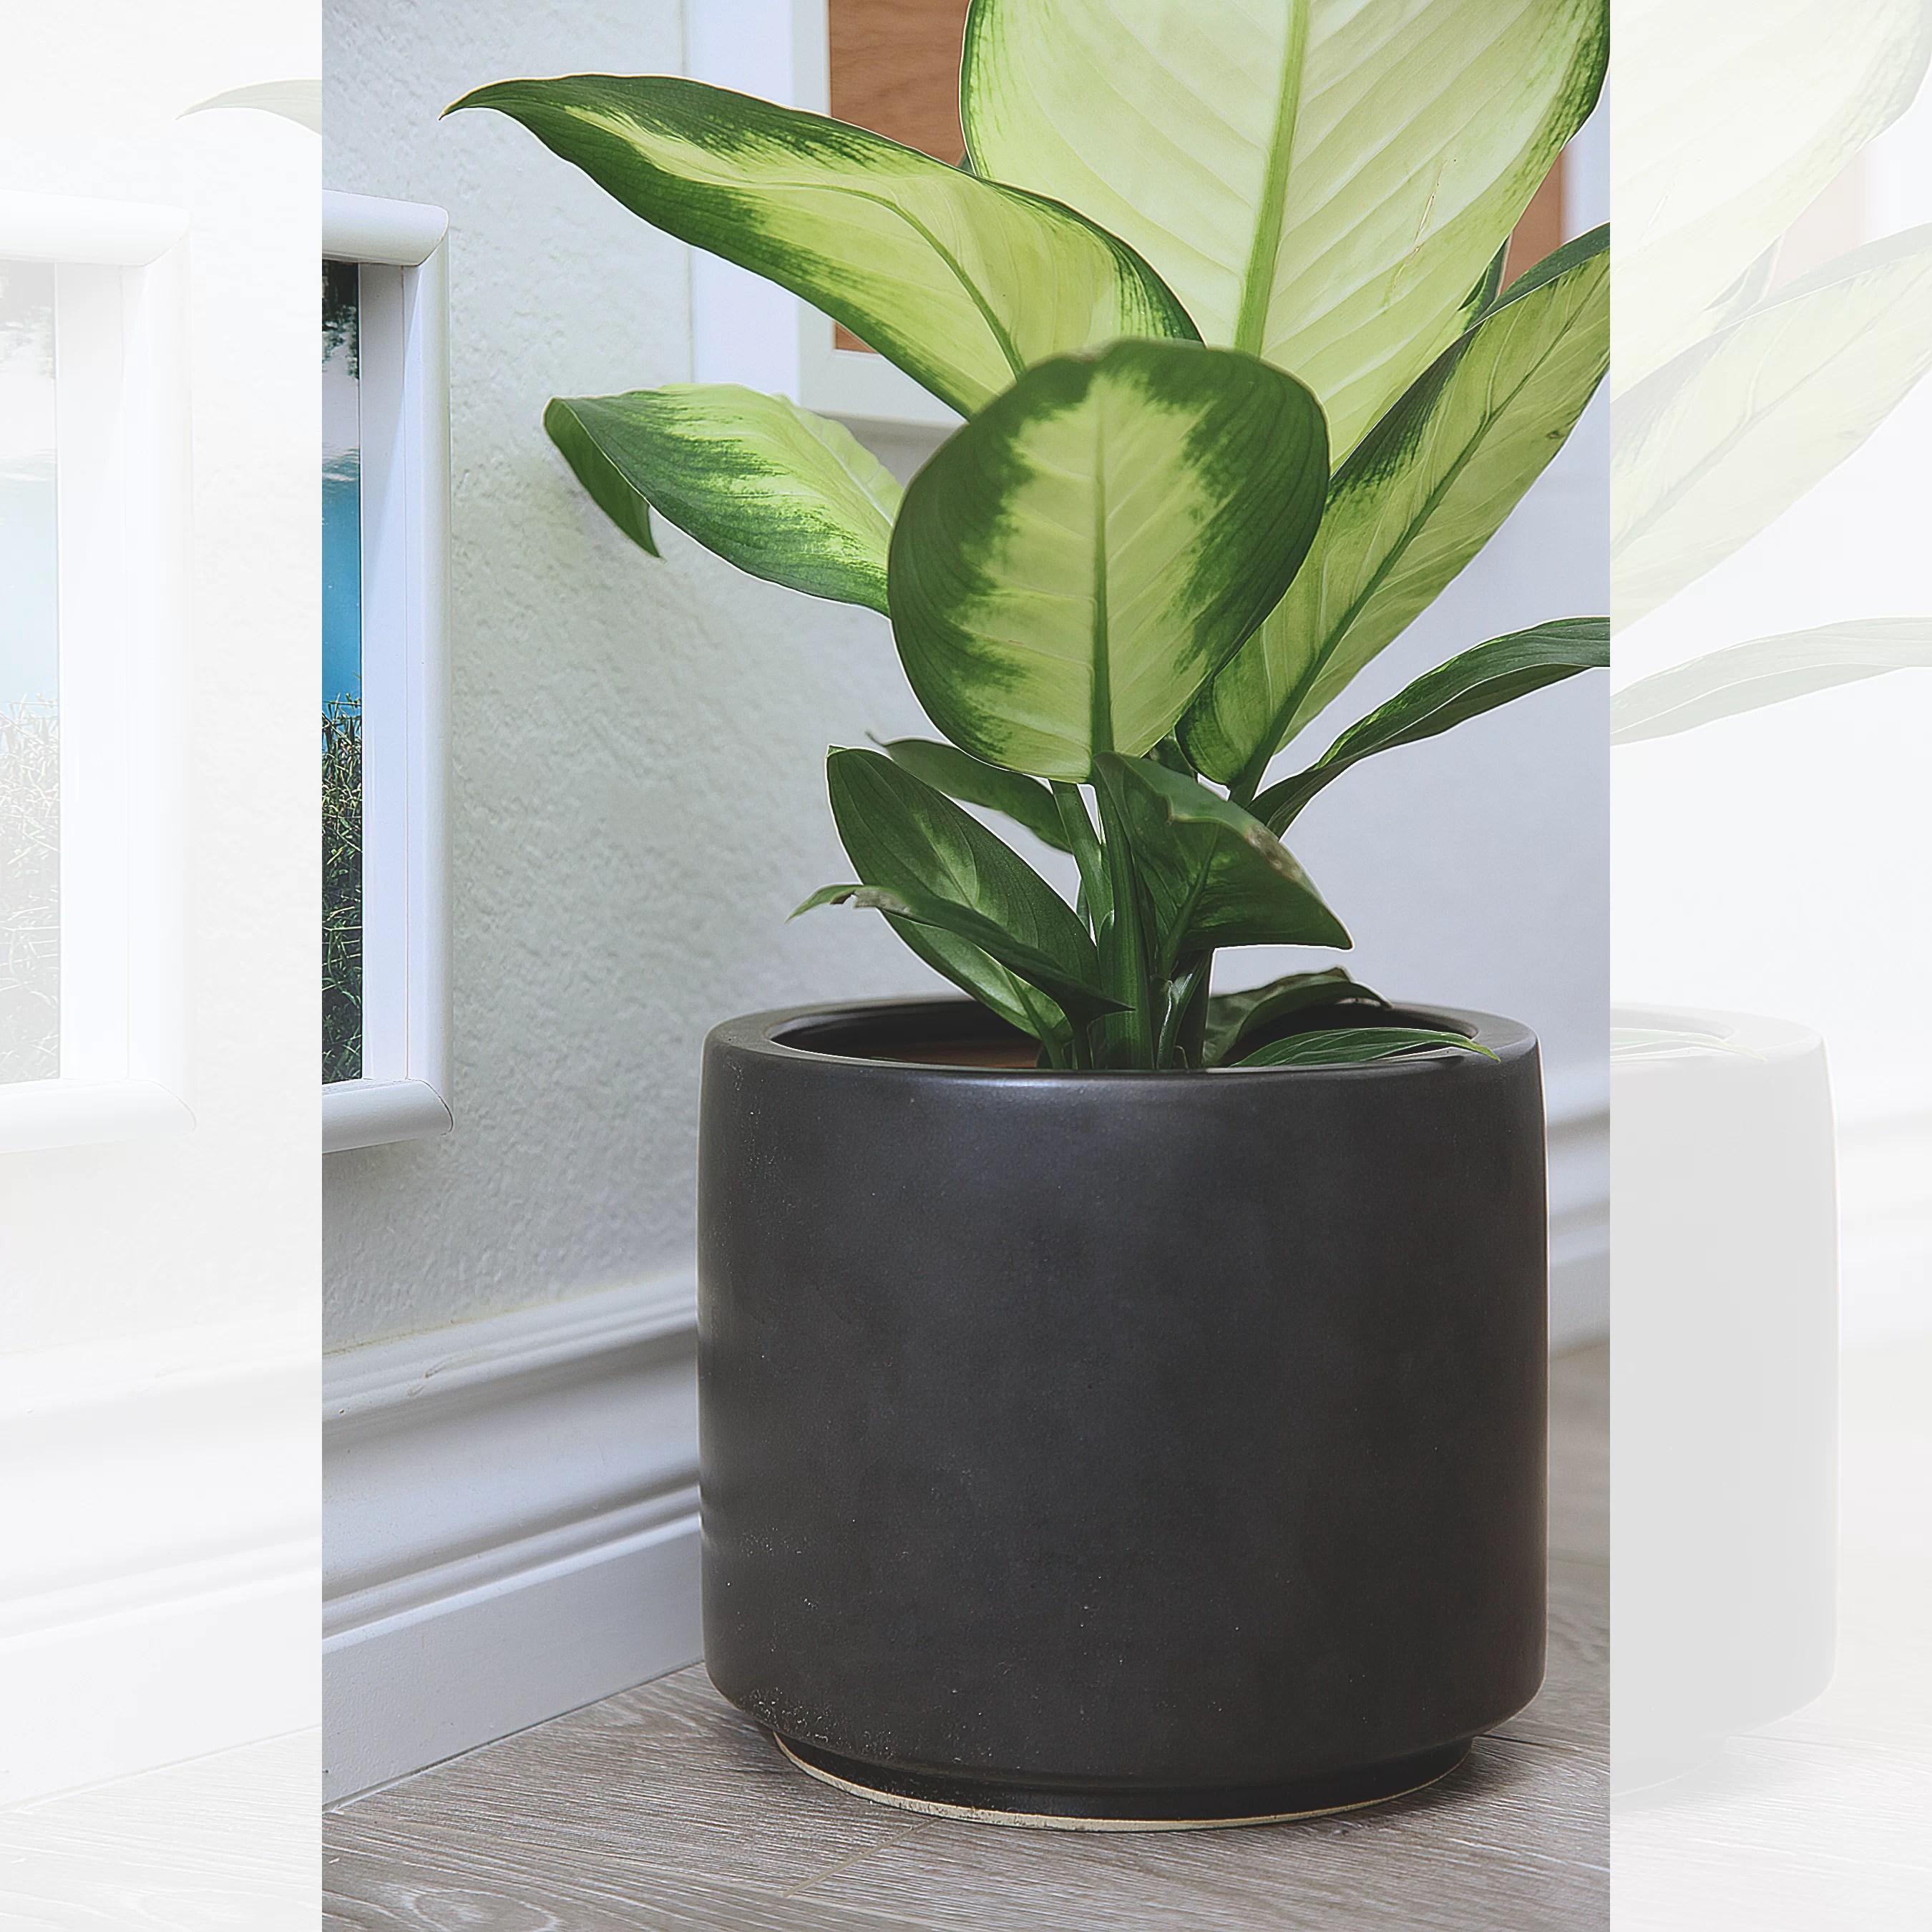 wayfair black planters you ll love in